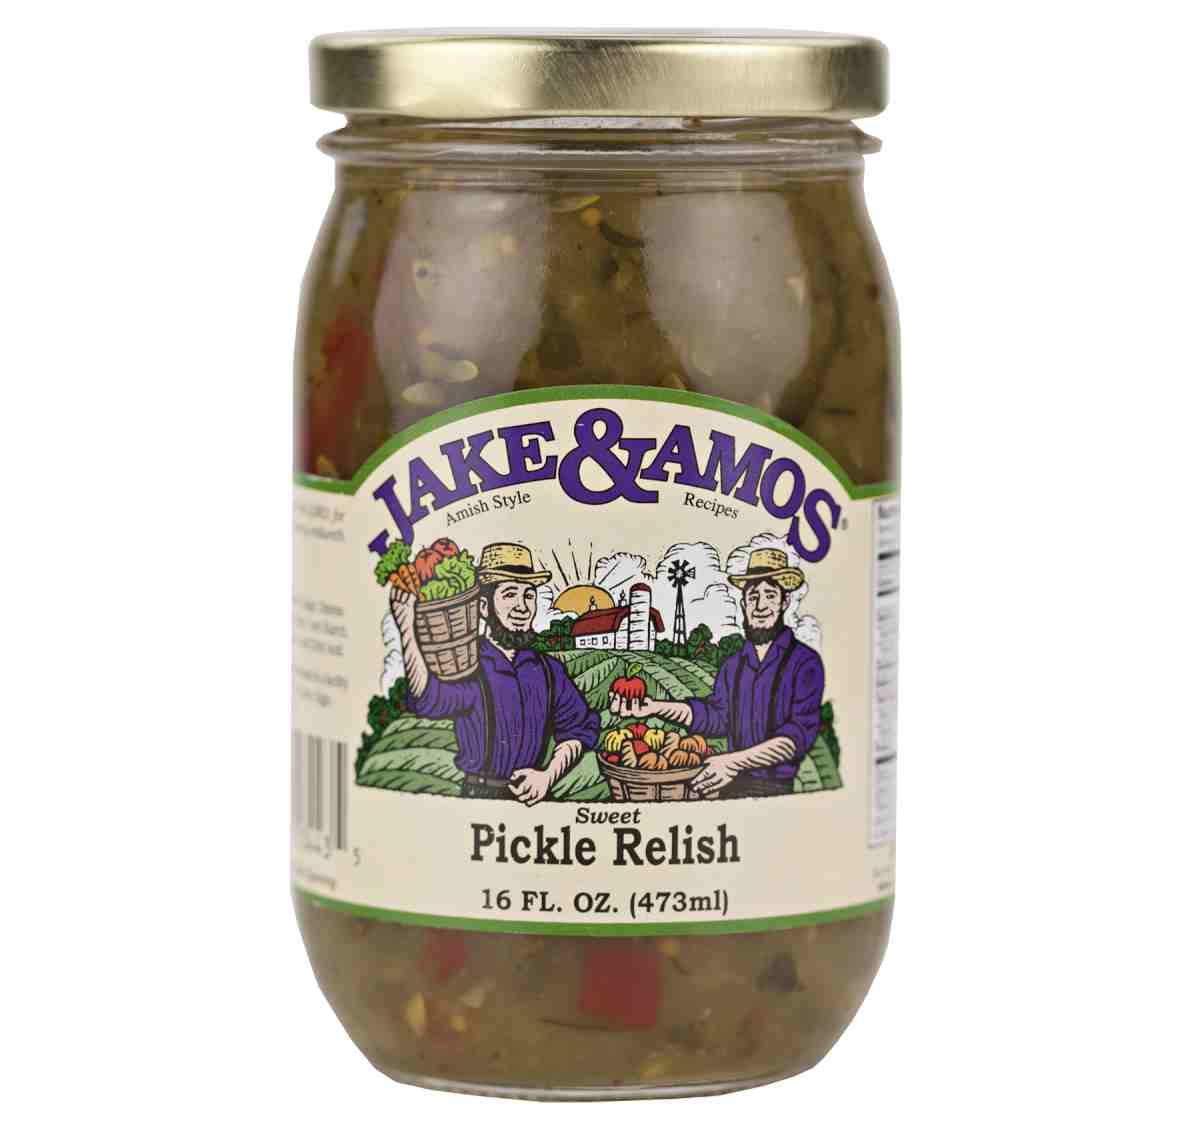 Jake & Amos Sweet Pickle Relish 16 oz. (3 Jars)